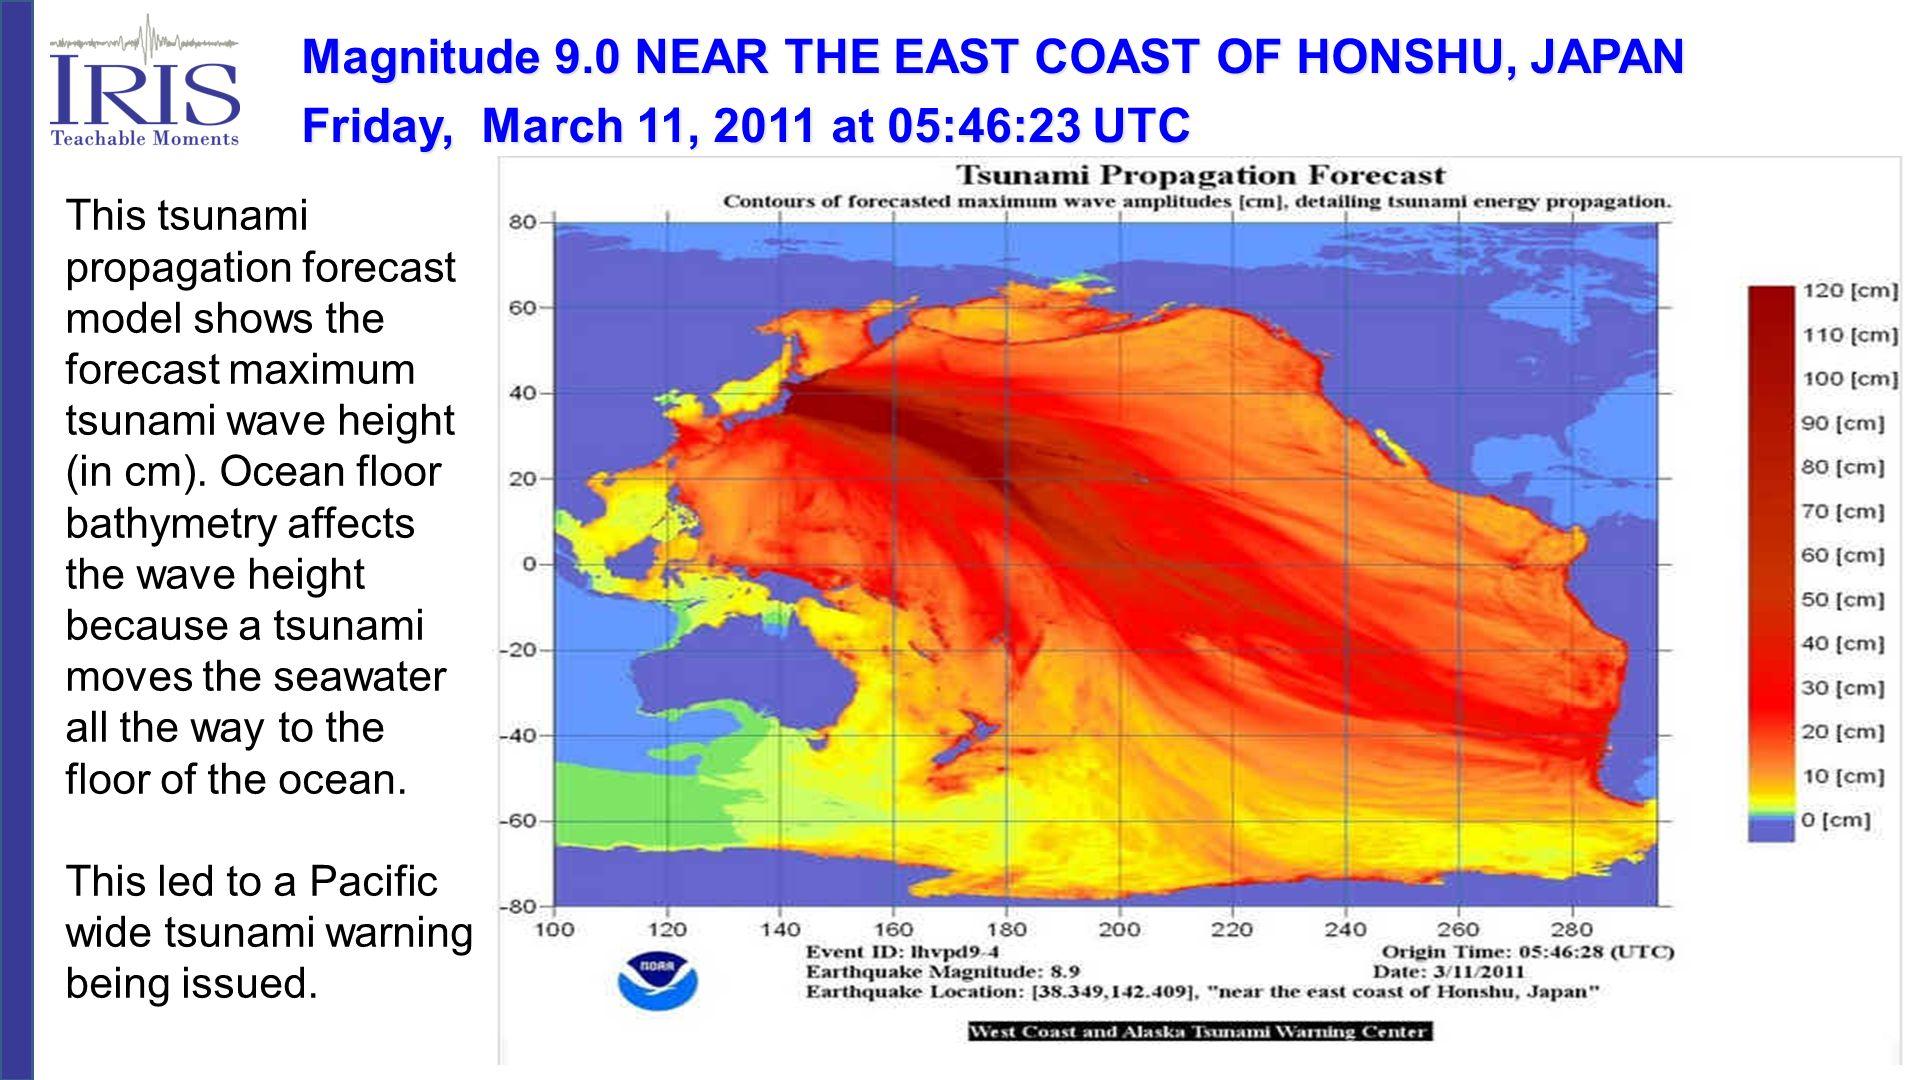 This tsunami propagation forecast model shows the forecast maximum tsunami wave height (in cm).